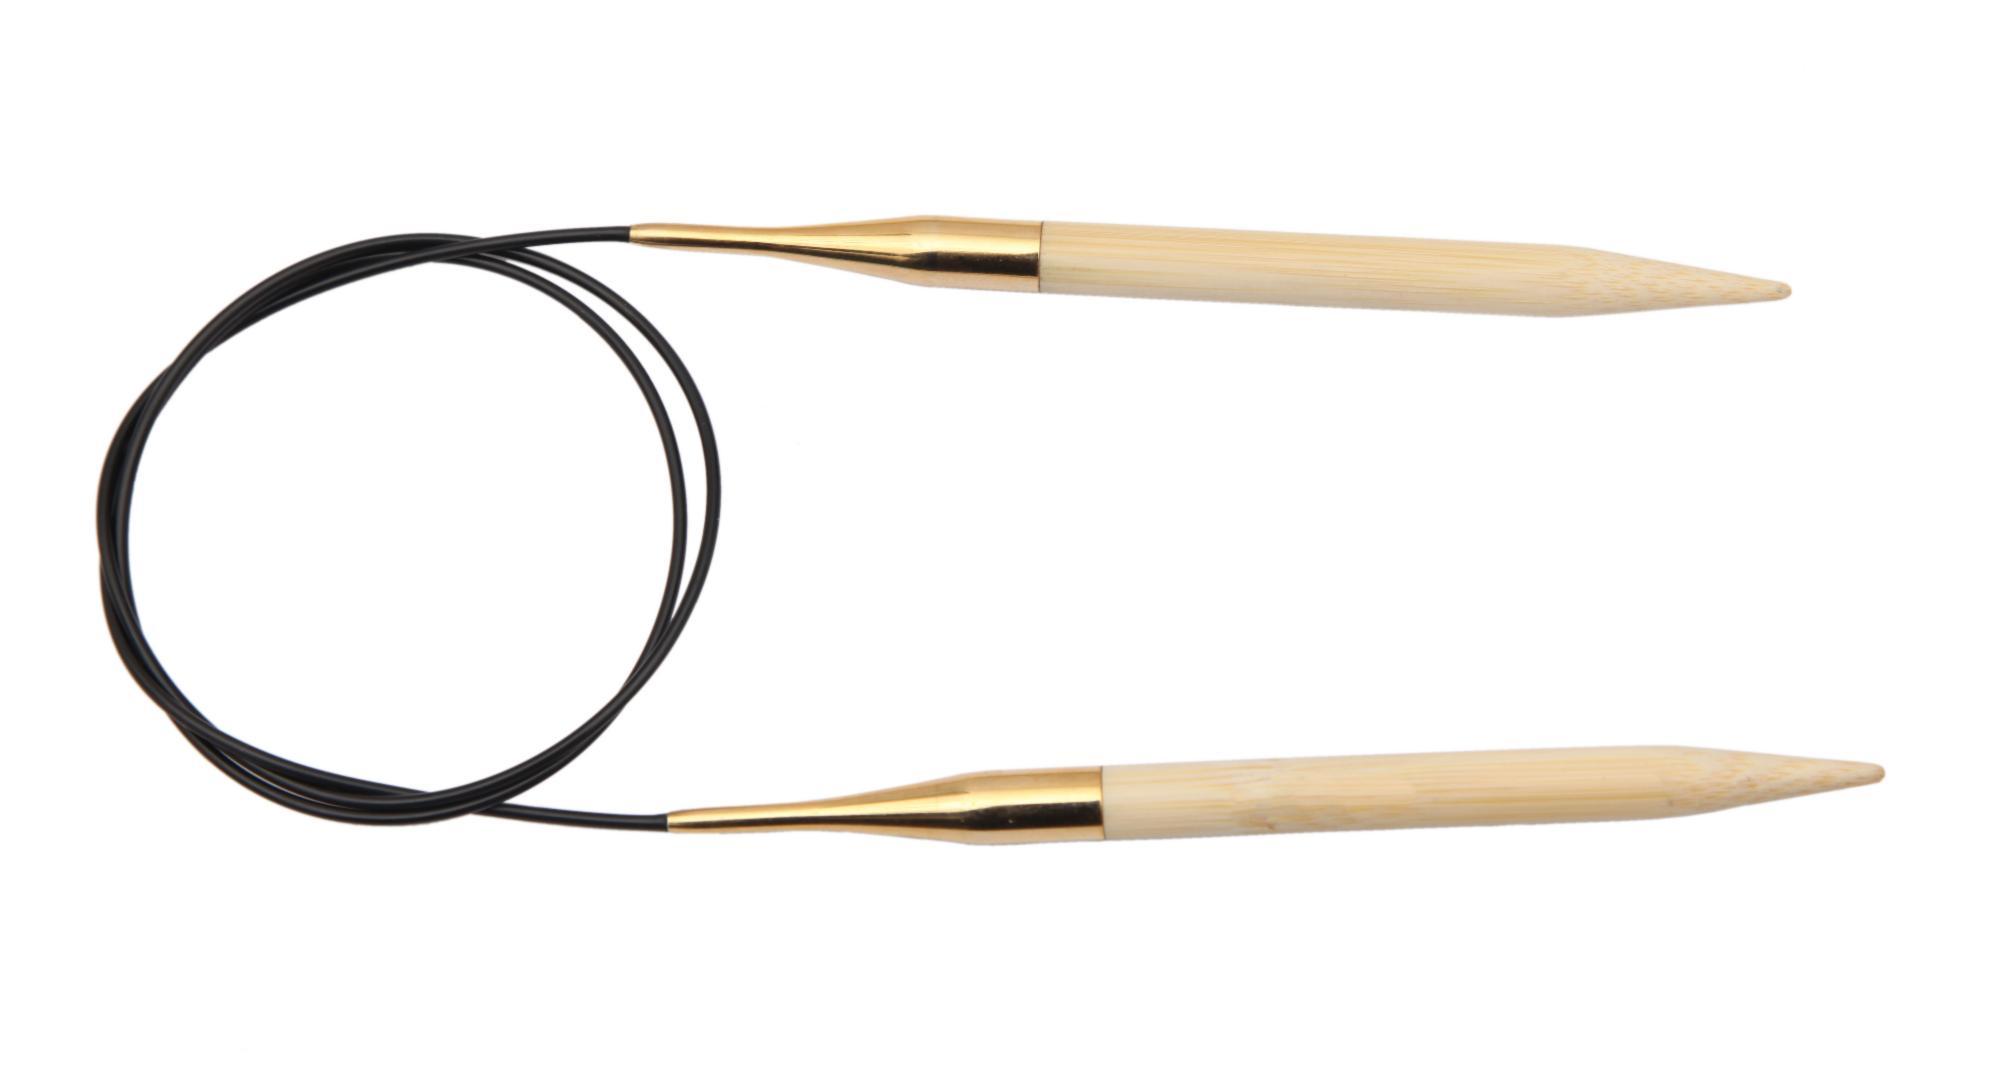 Спицы круговые 100 см Bamboo KnitPro, 22272, 6.50 мм